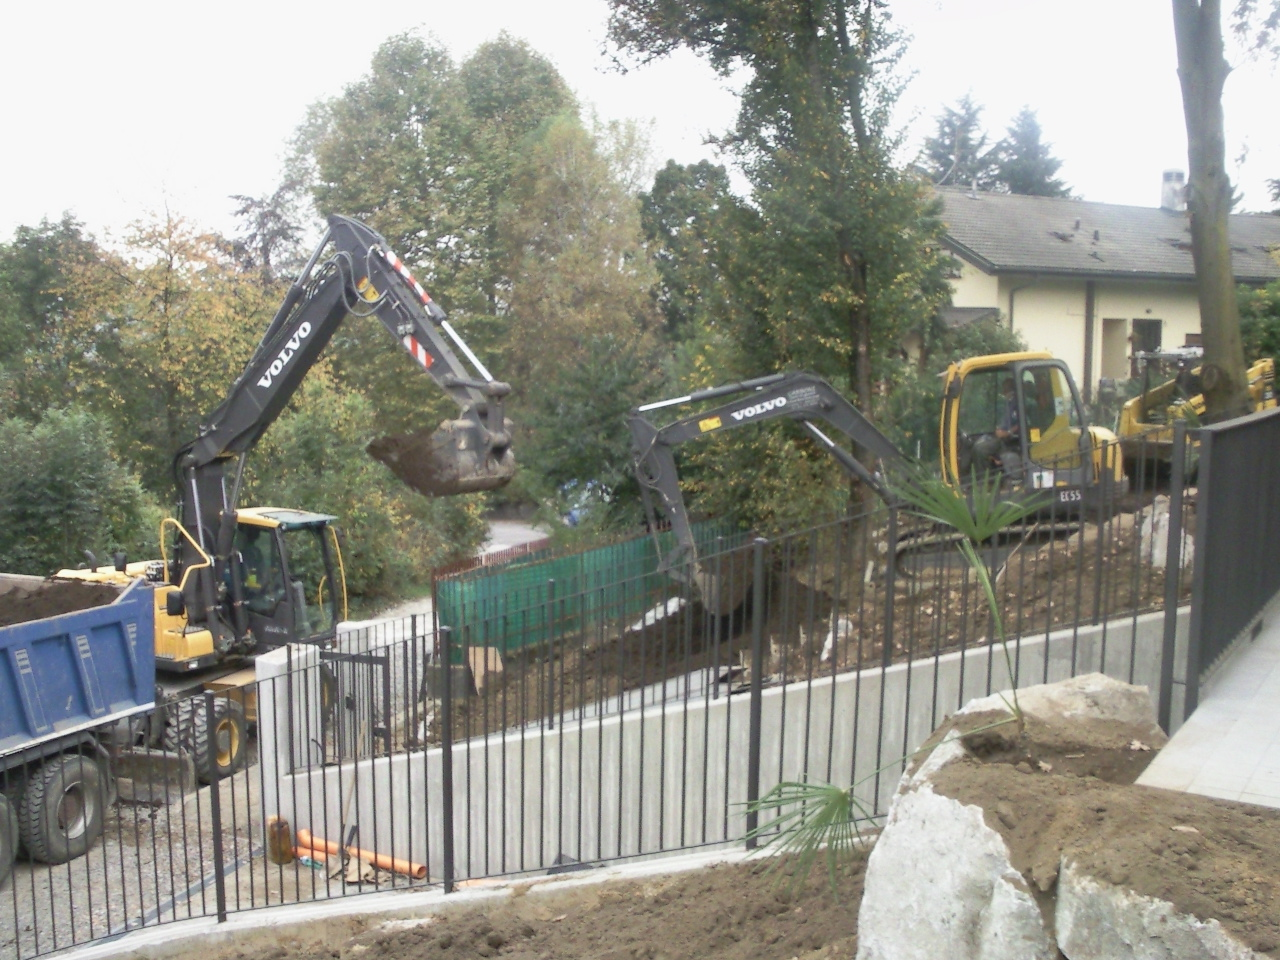 Parco macchine Rocks Gardens Design (54)